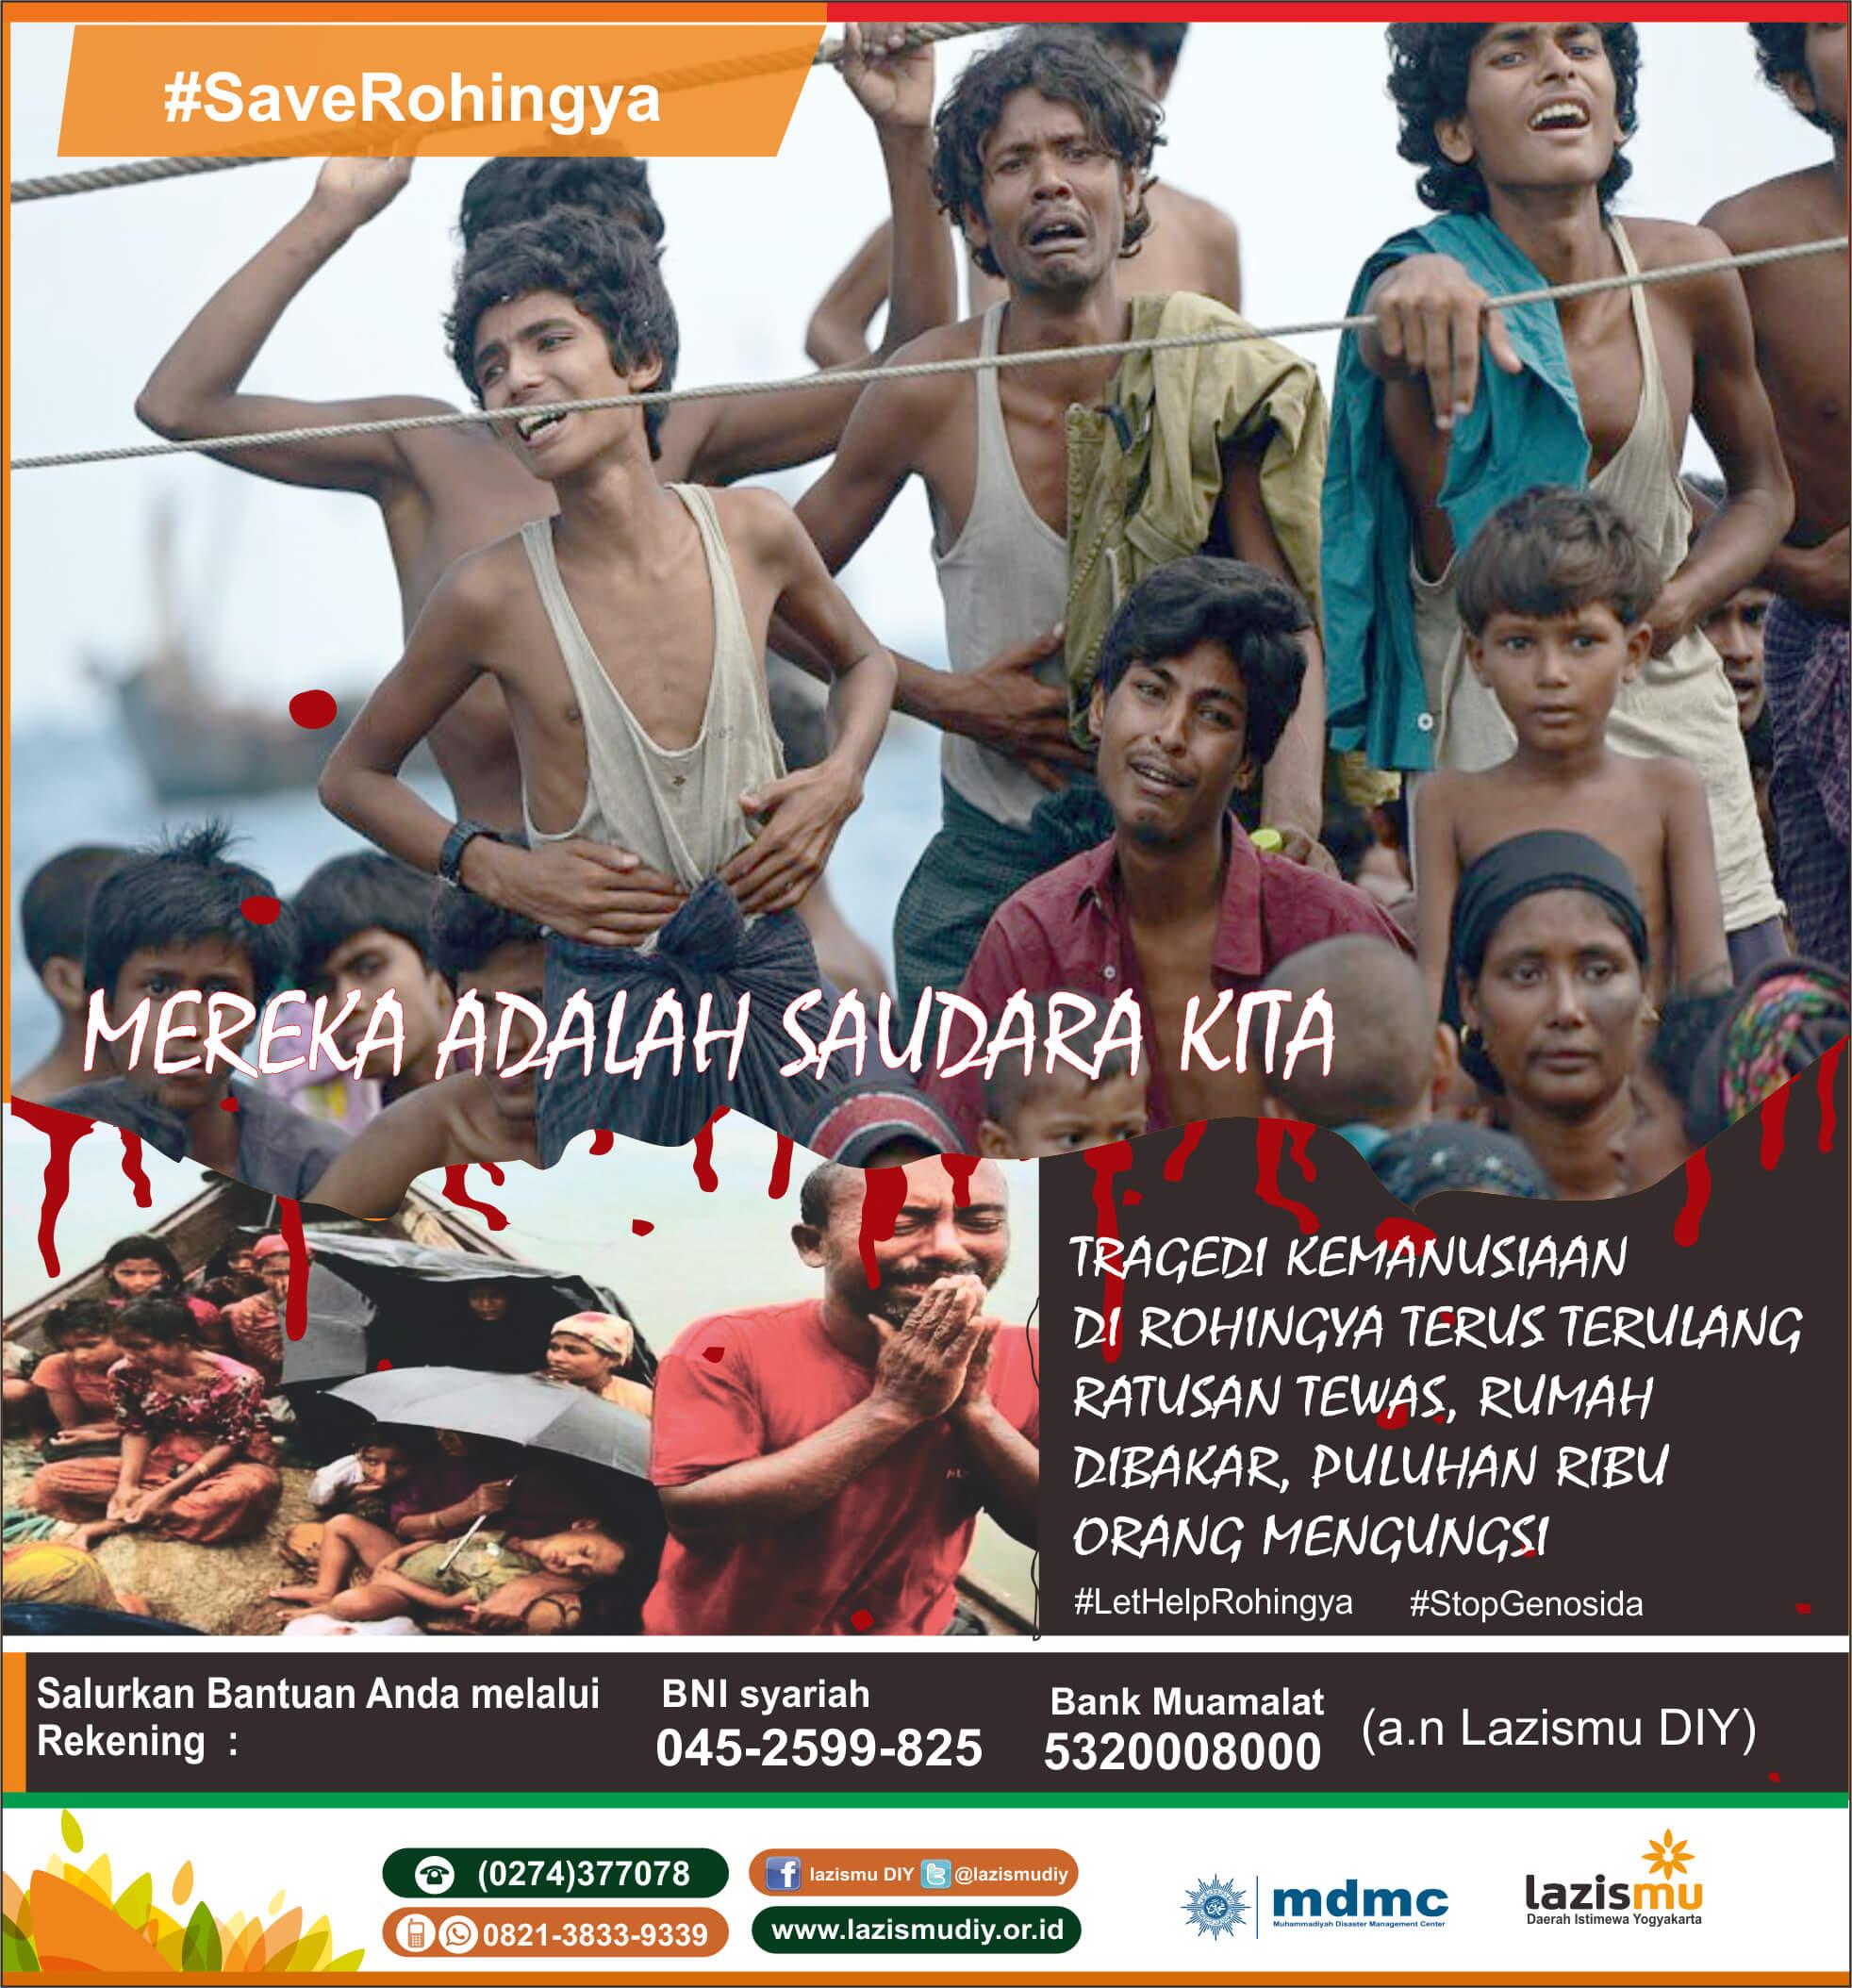 Save Rohingya